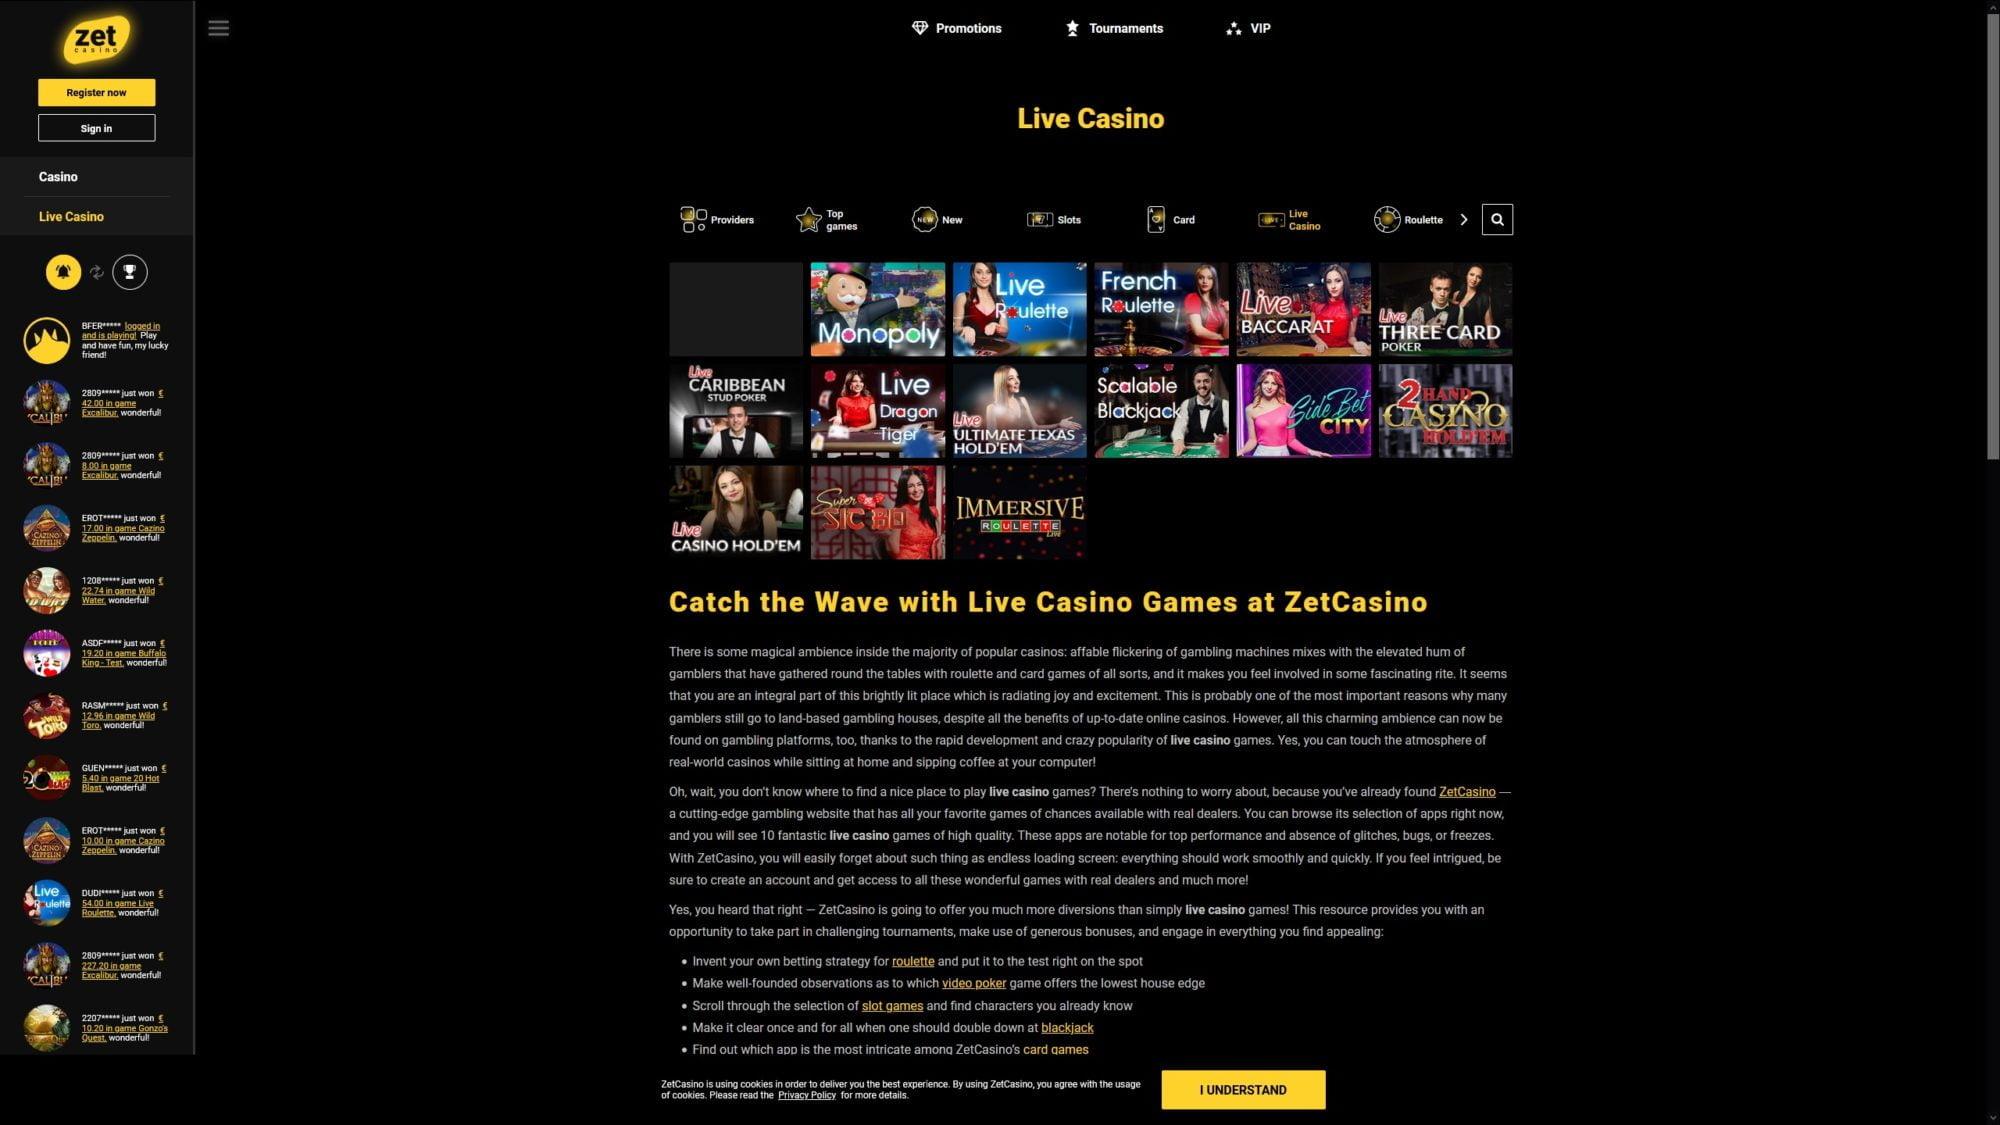 Try Online Casino at Zet Casino